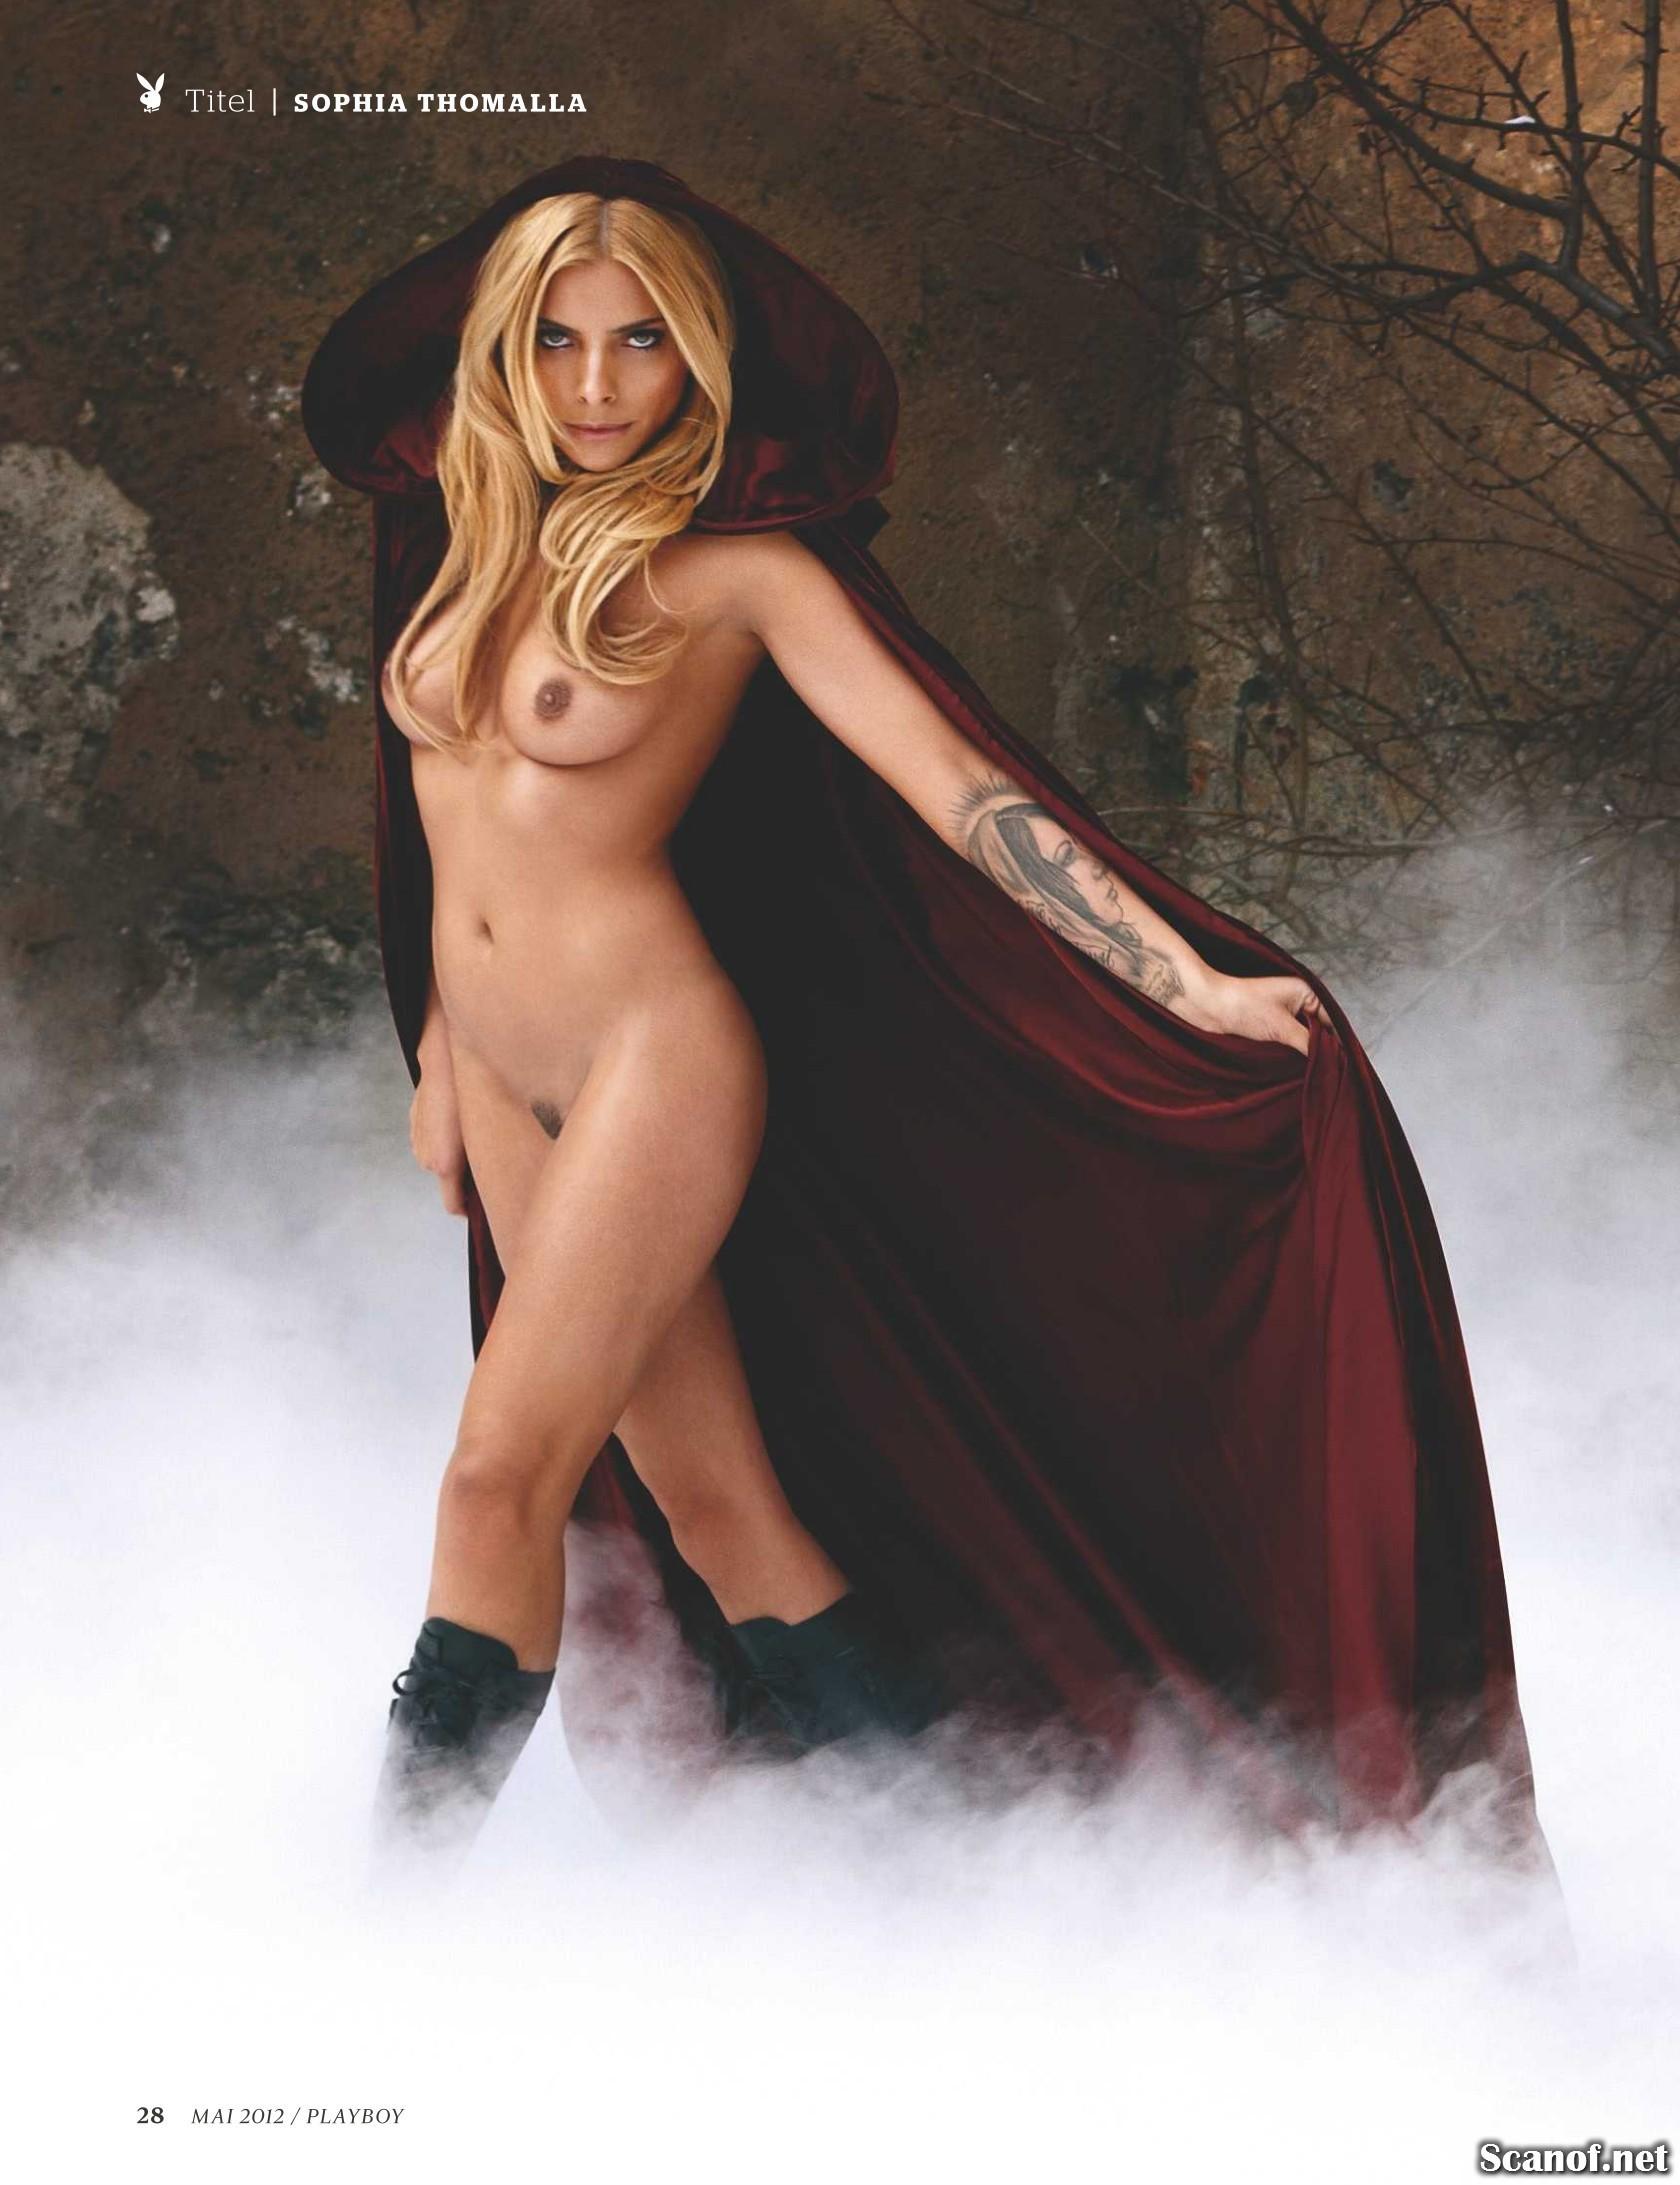 Sophia Thomalla Nude Naked Pics And Videos Imperiodefamosas